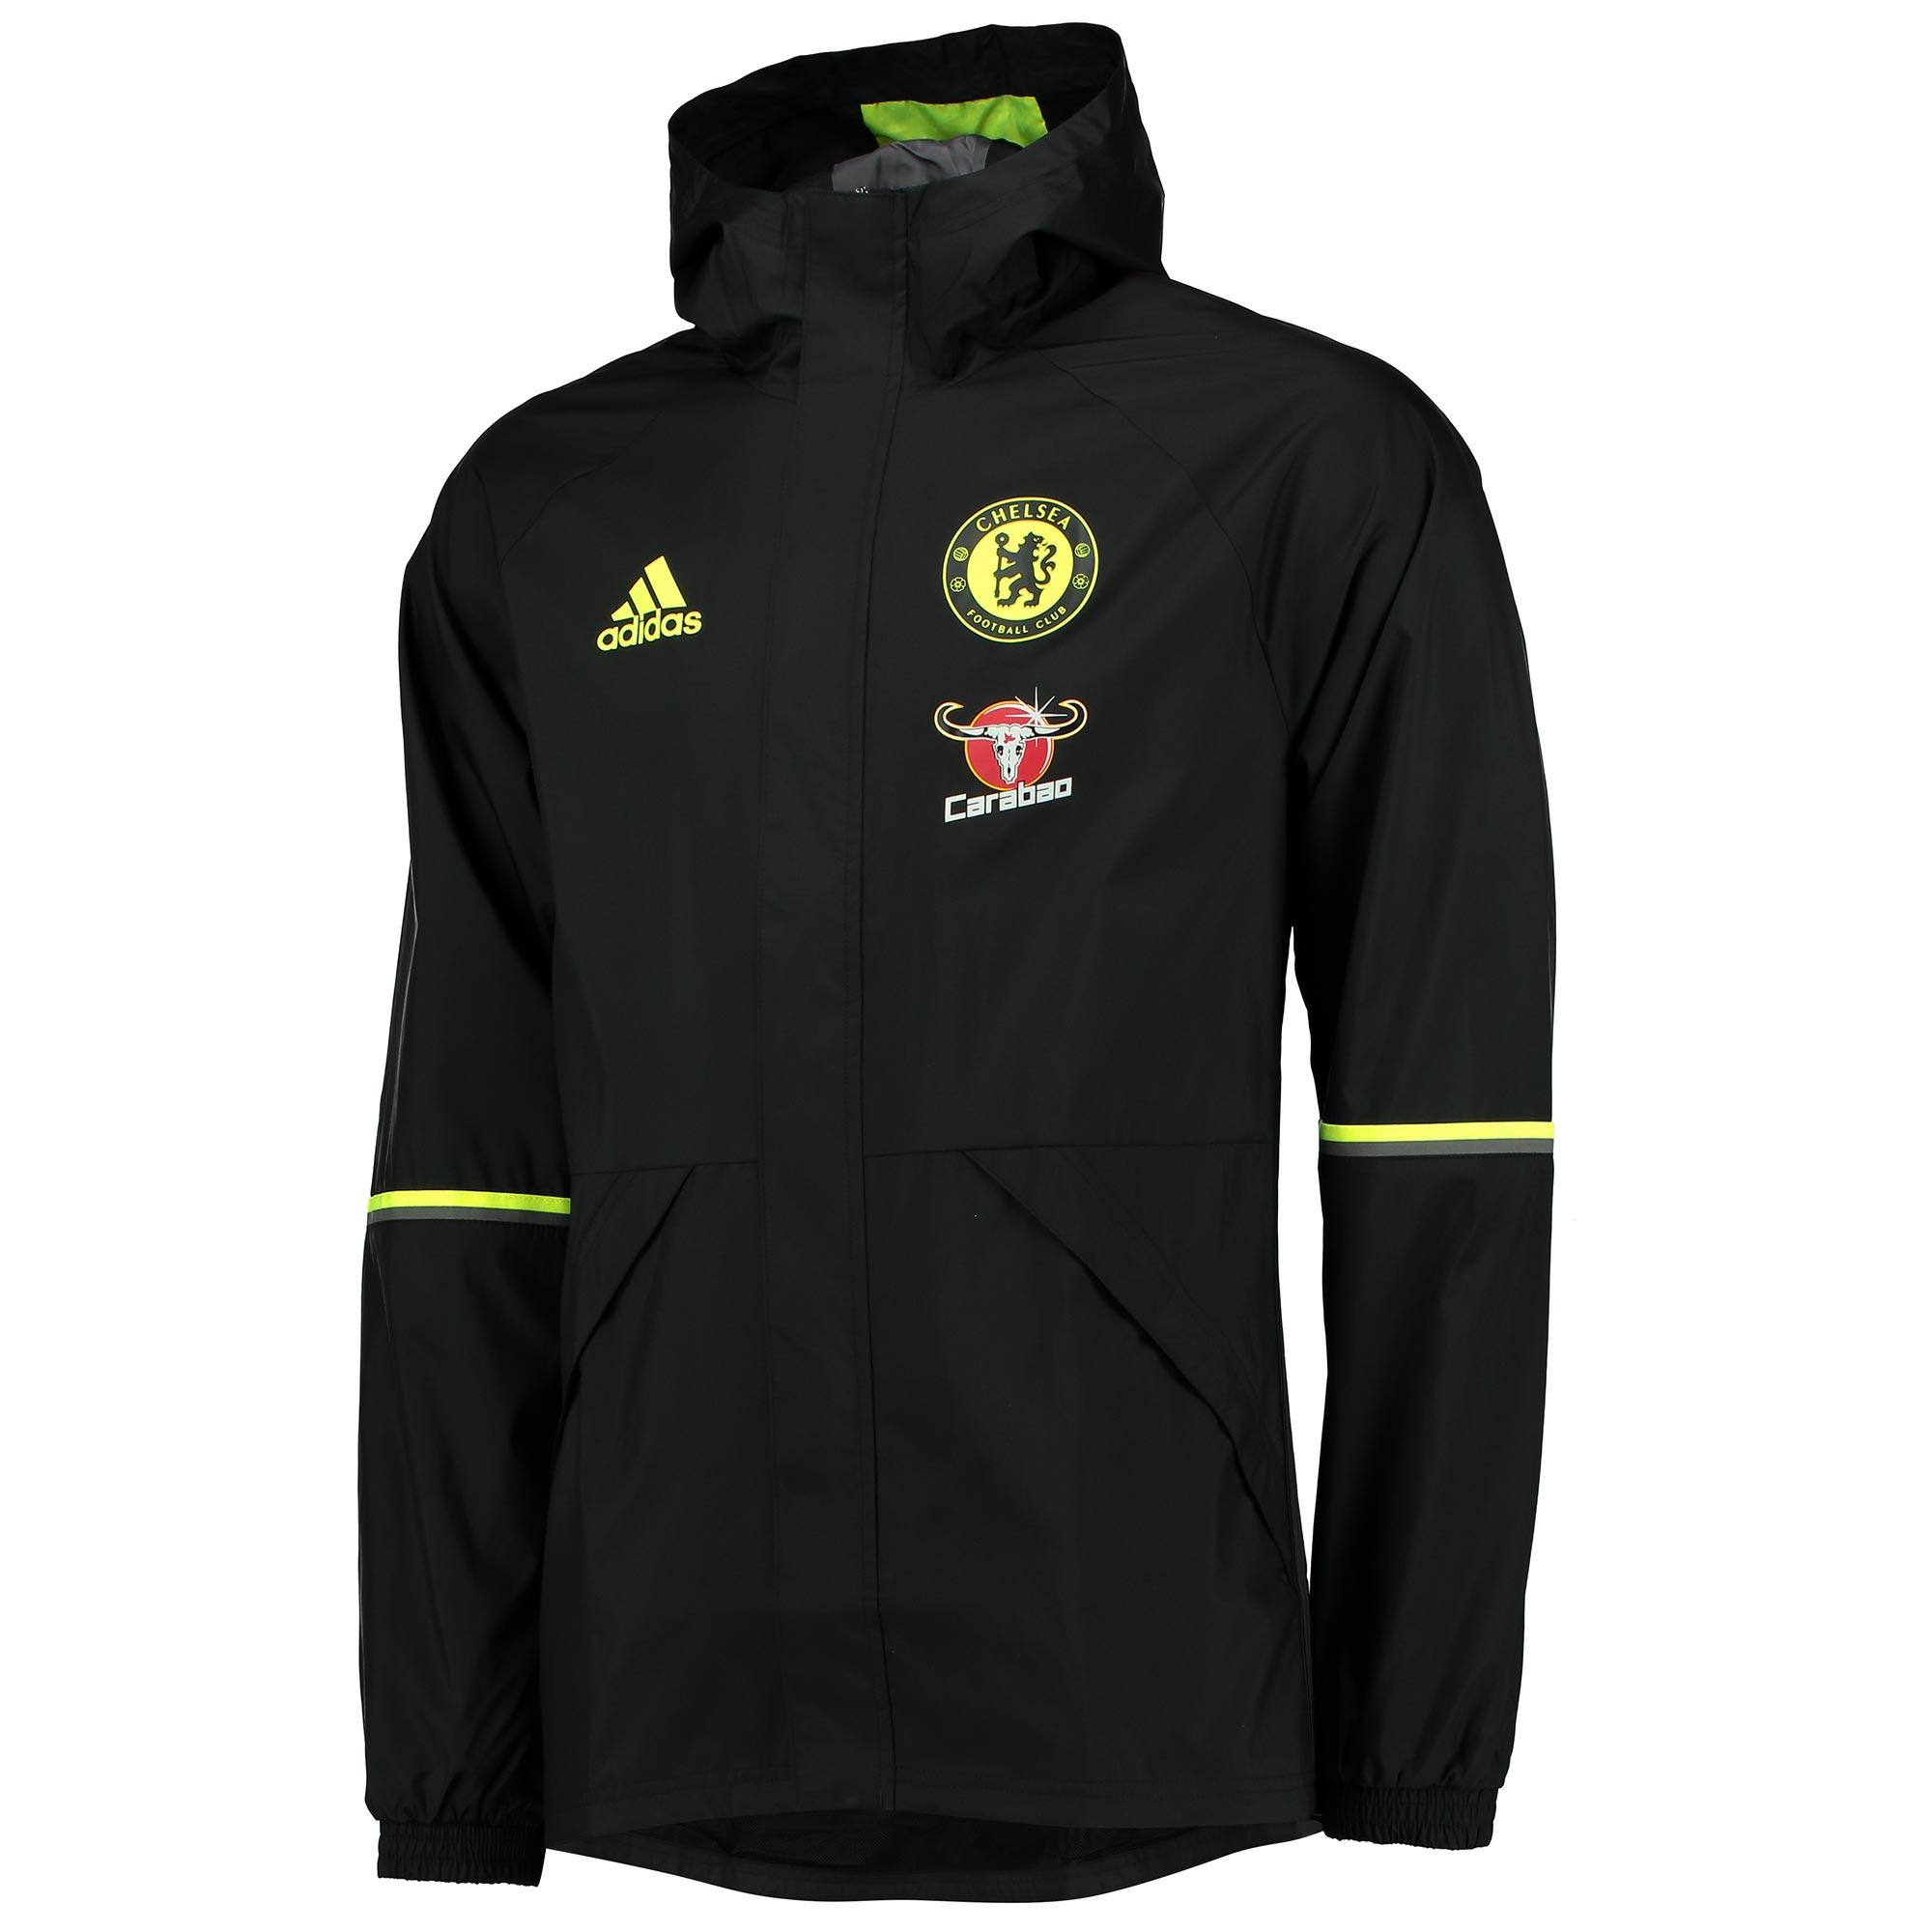 Chelsea Training All Weather Jacket - Black